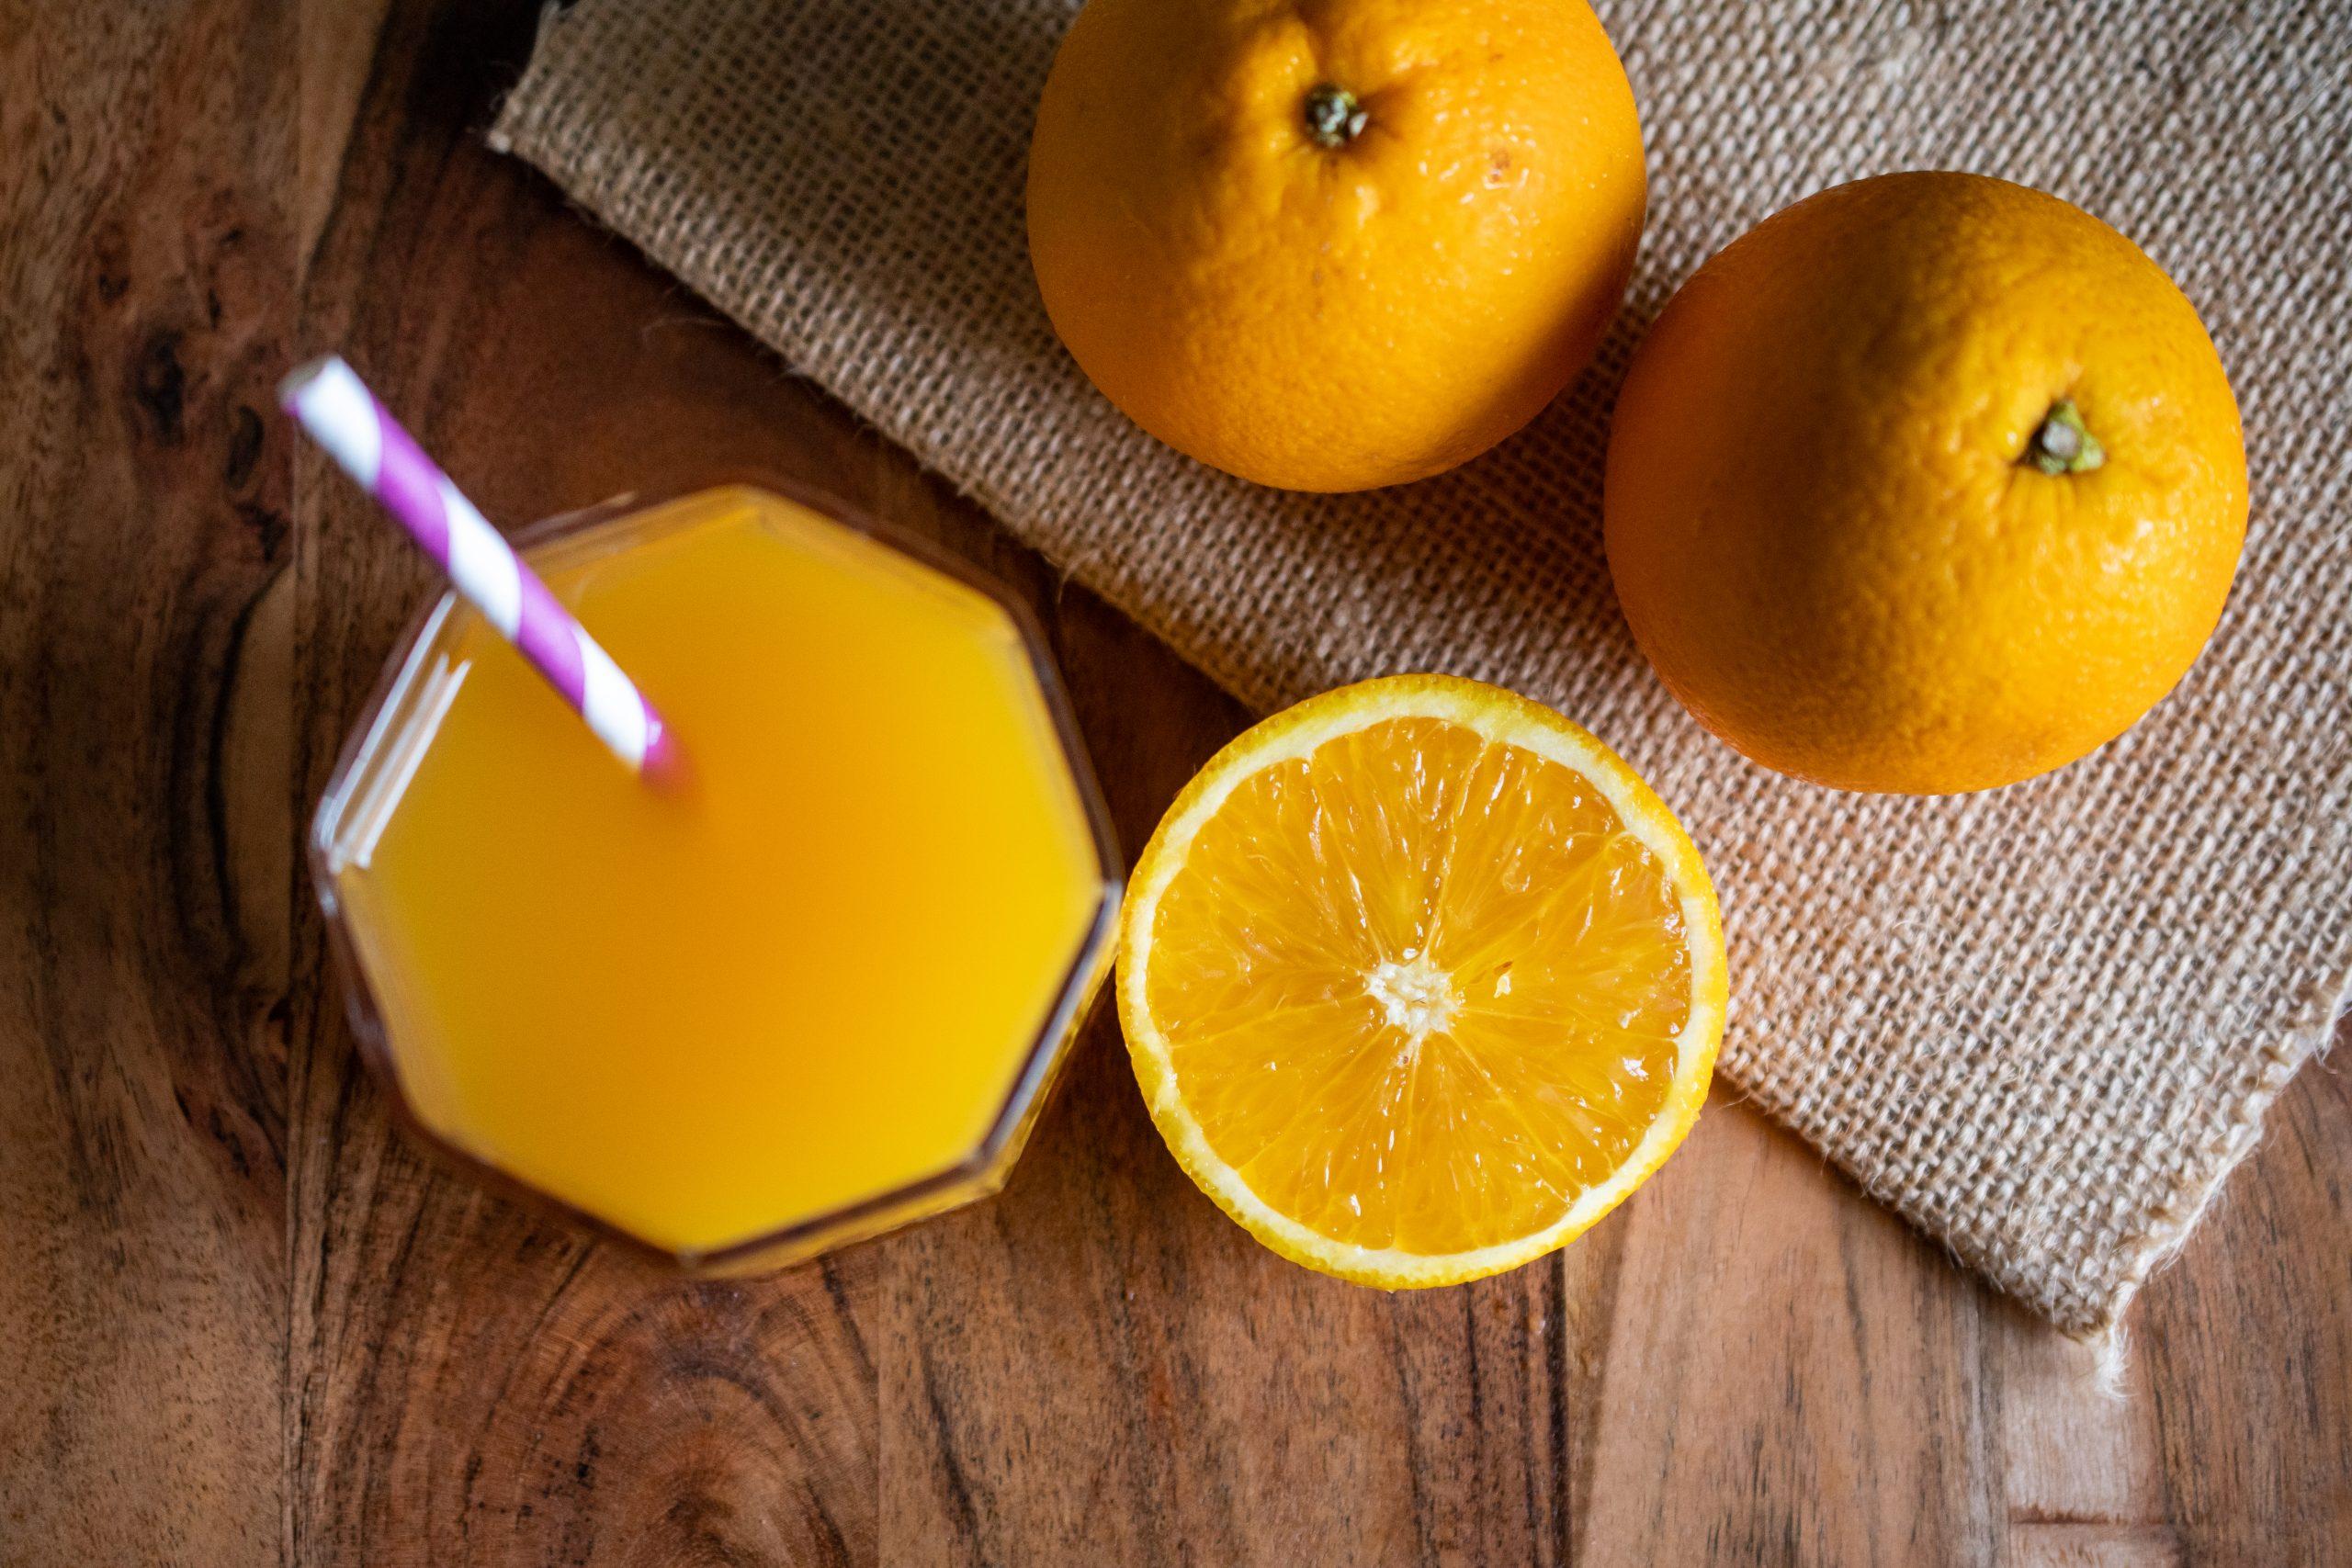 oranges and orange juice in glass